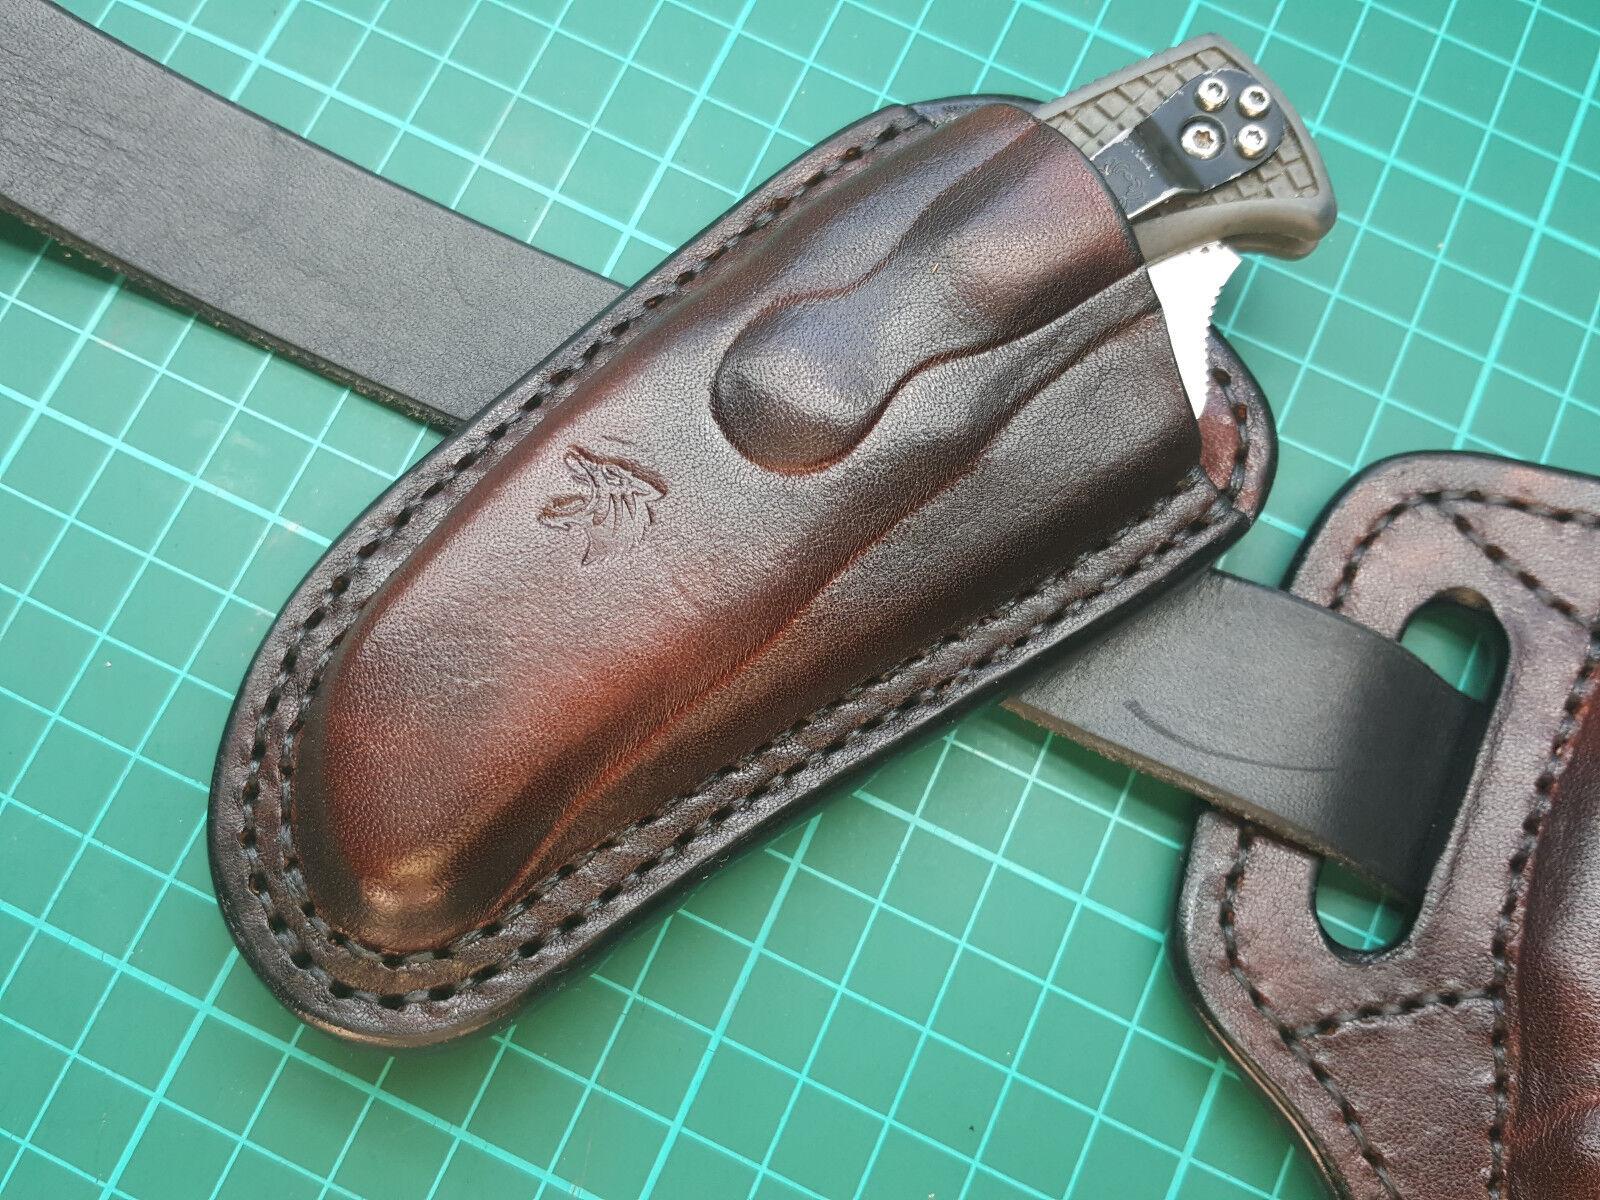 Leather pancake sheath for Spyderco Yojimbo 2 or Endura 4